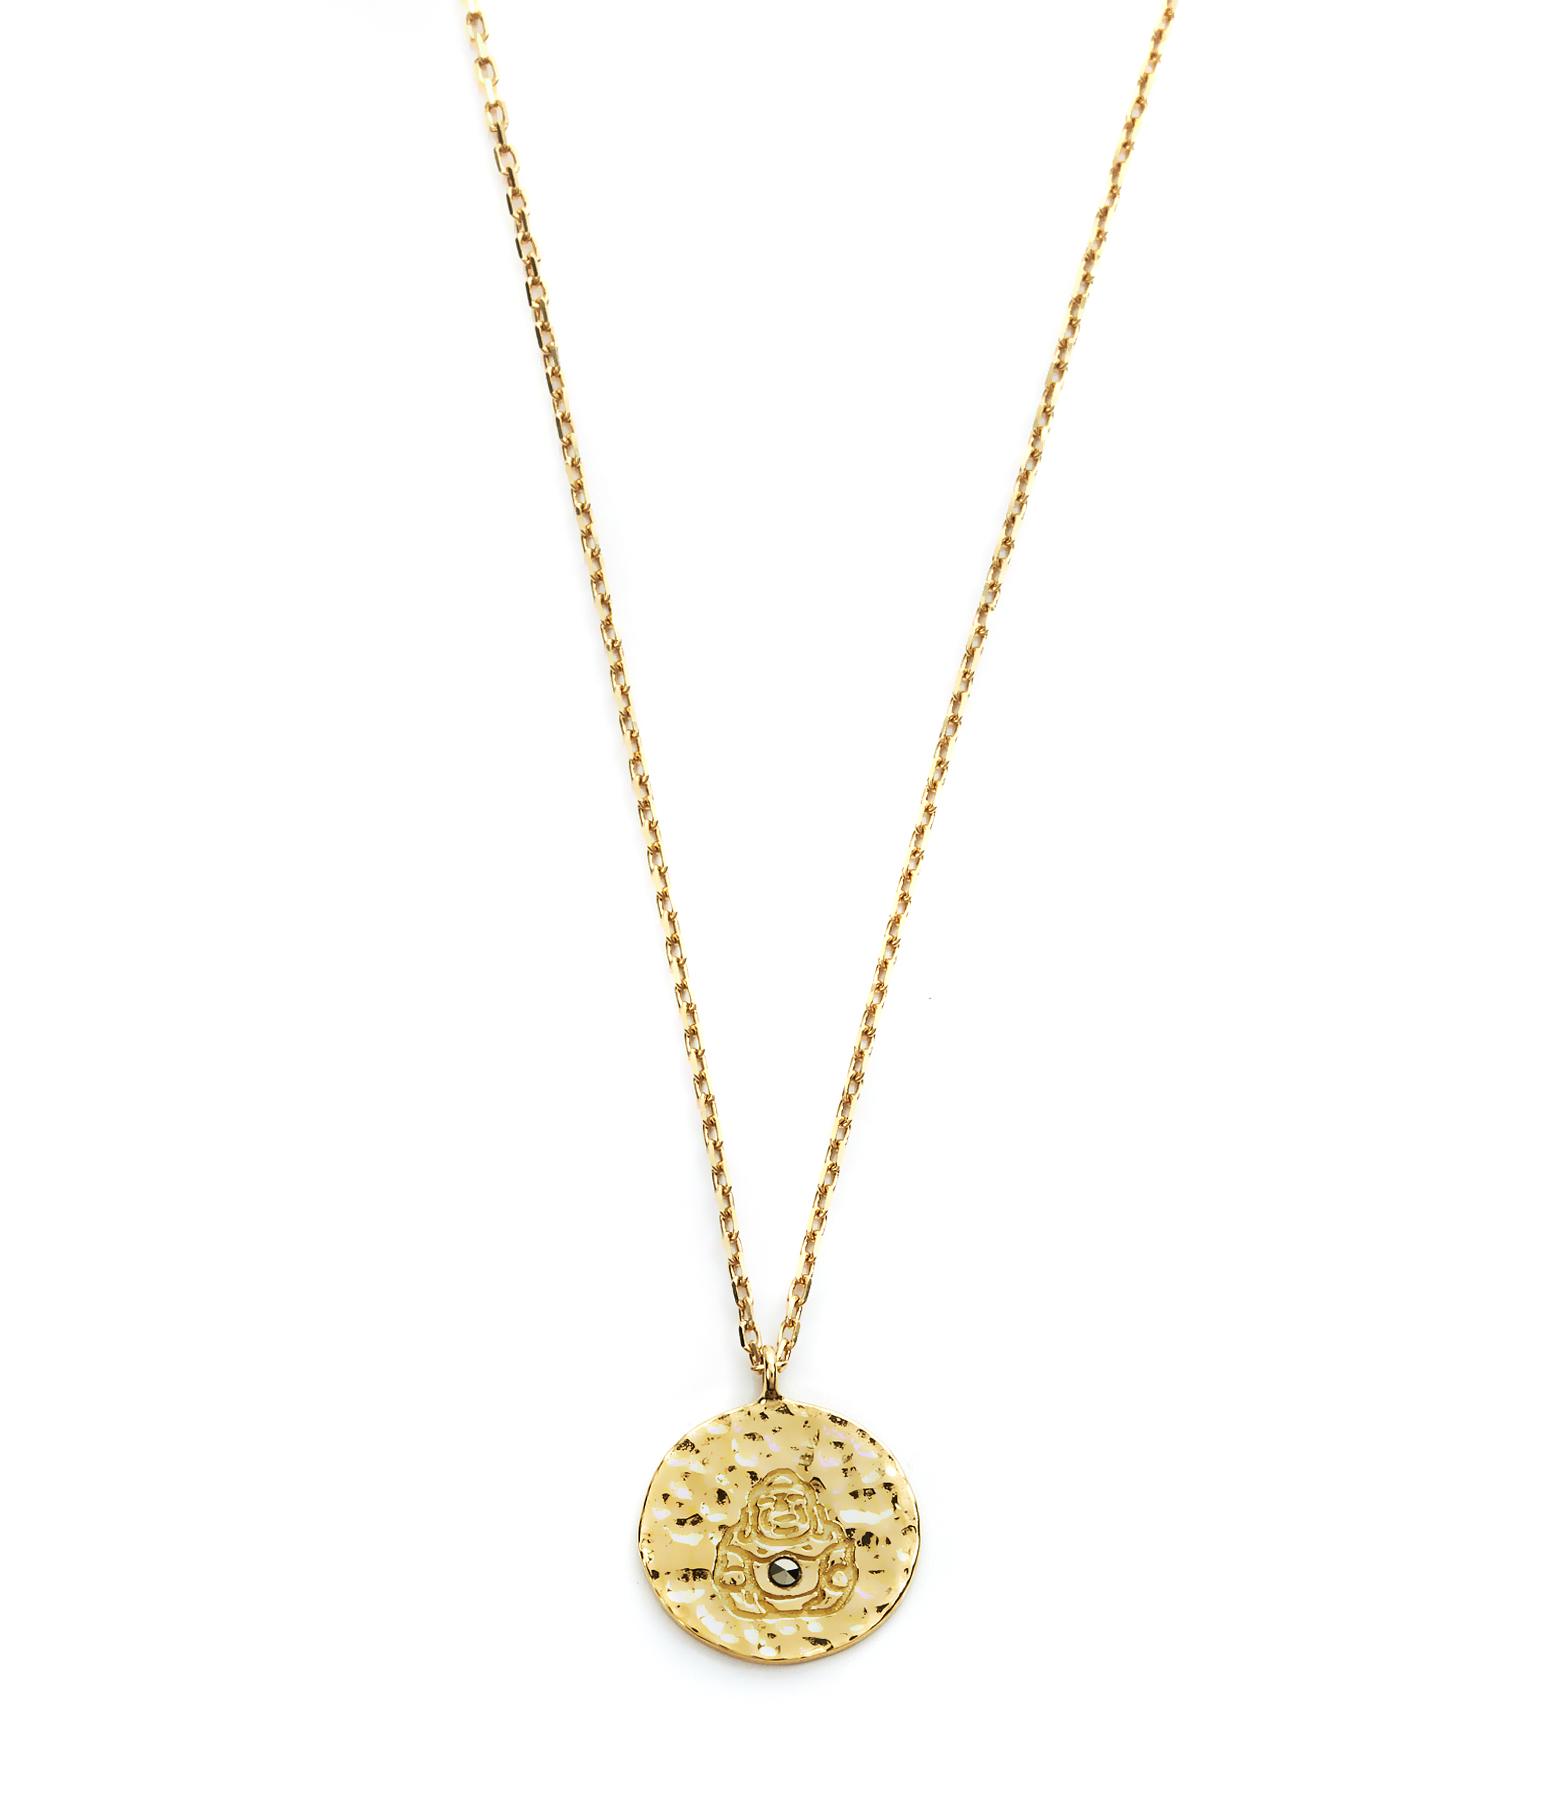 Collier Long Médaille Buddha Ibiza 9K